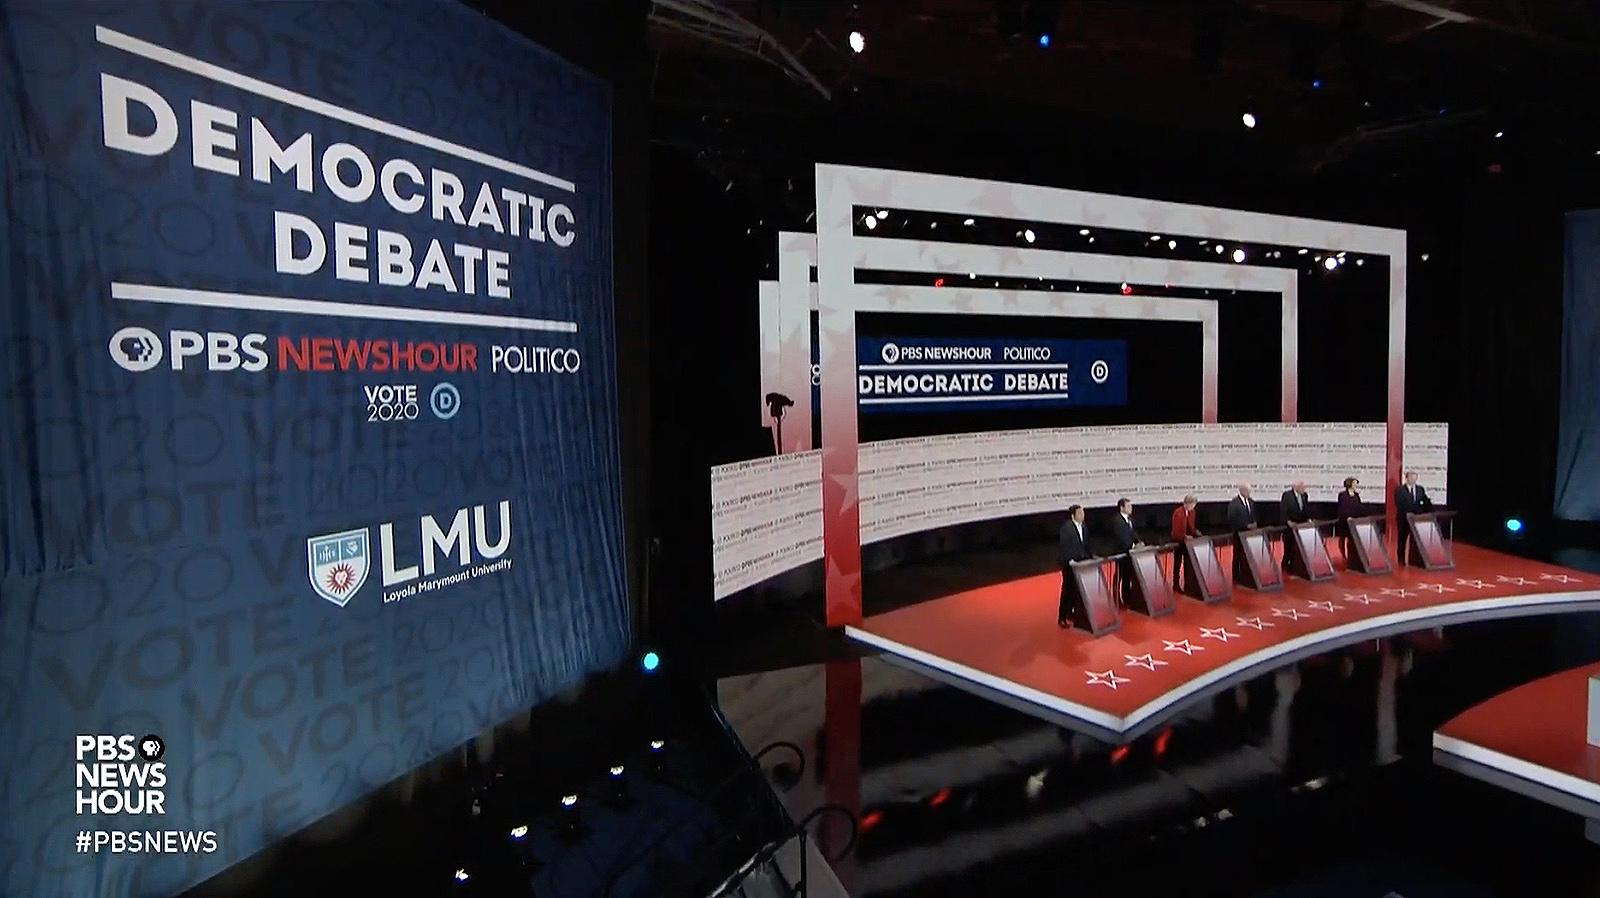 NCS_PBS-NewsHour_Politico_Democratic-Debate_001